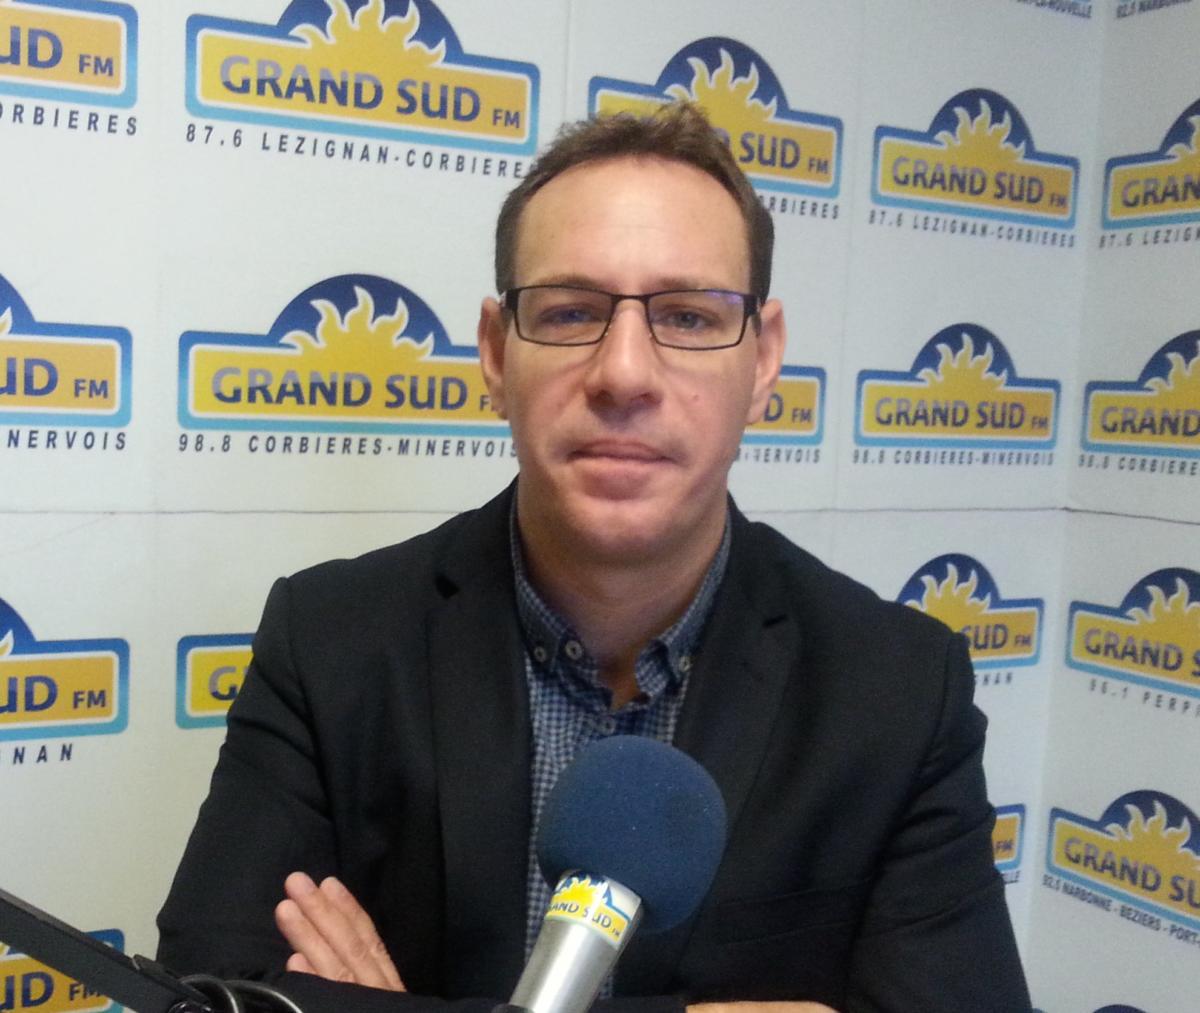 30-03-20 : Guillaume CARABIN, commissaire à Narbonne